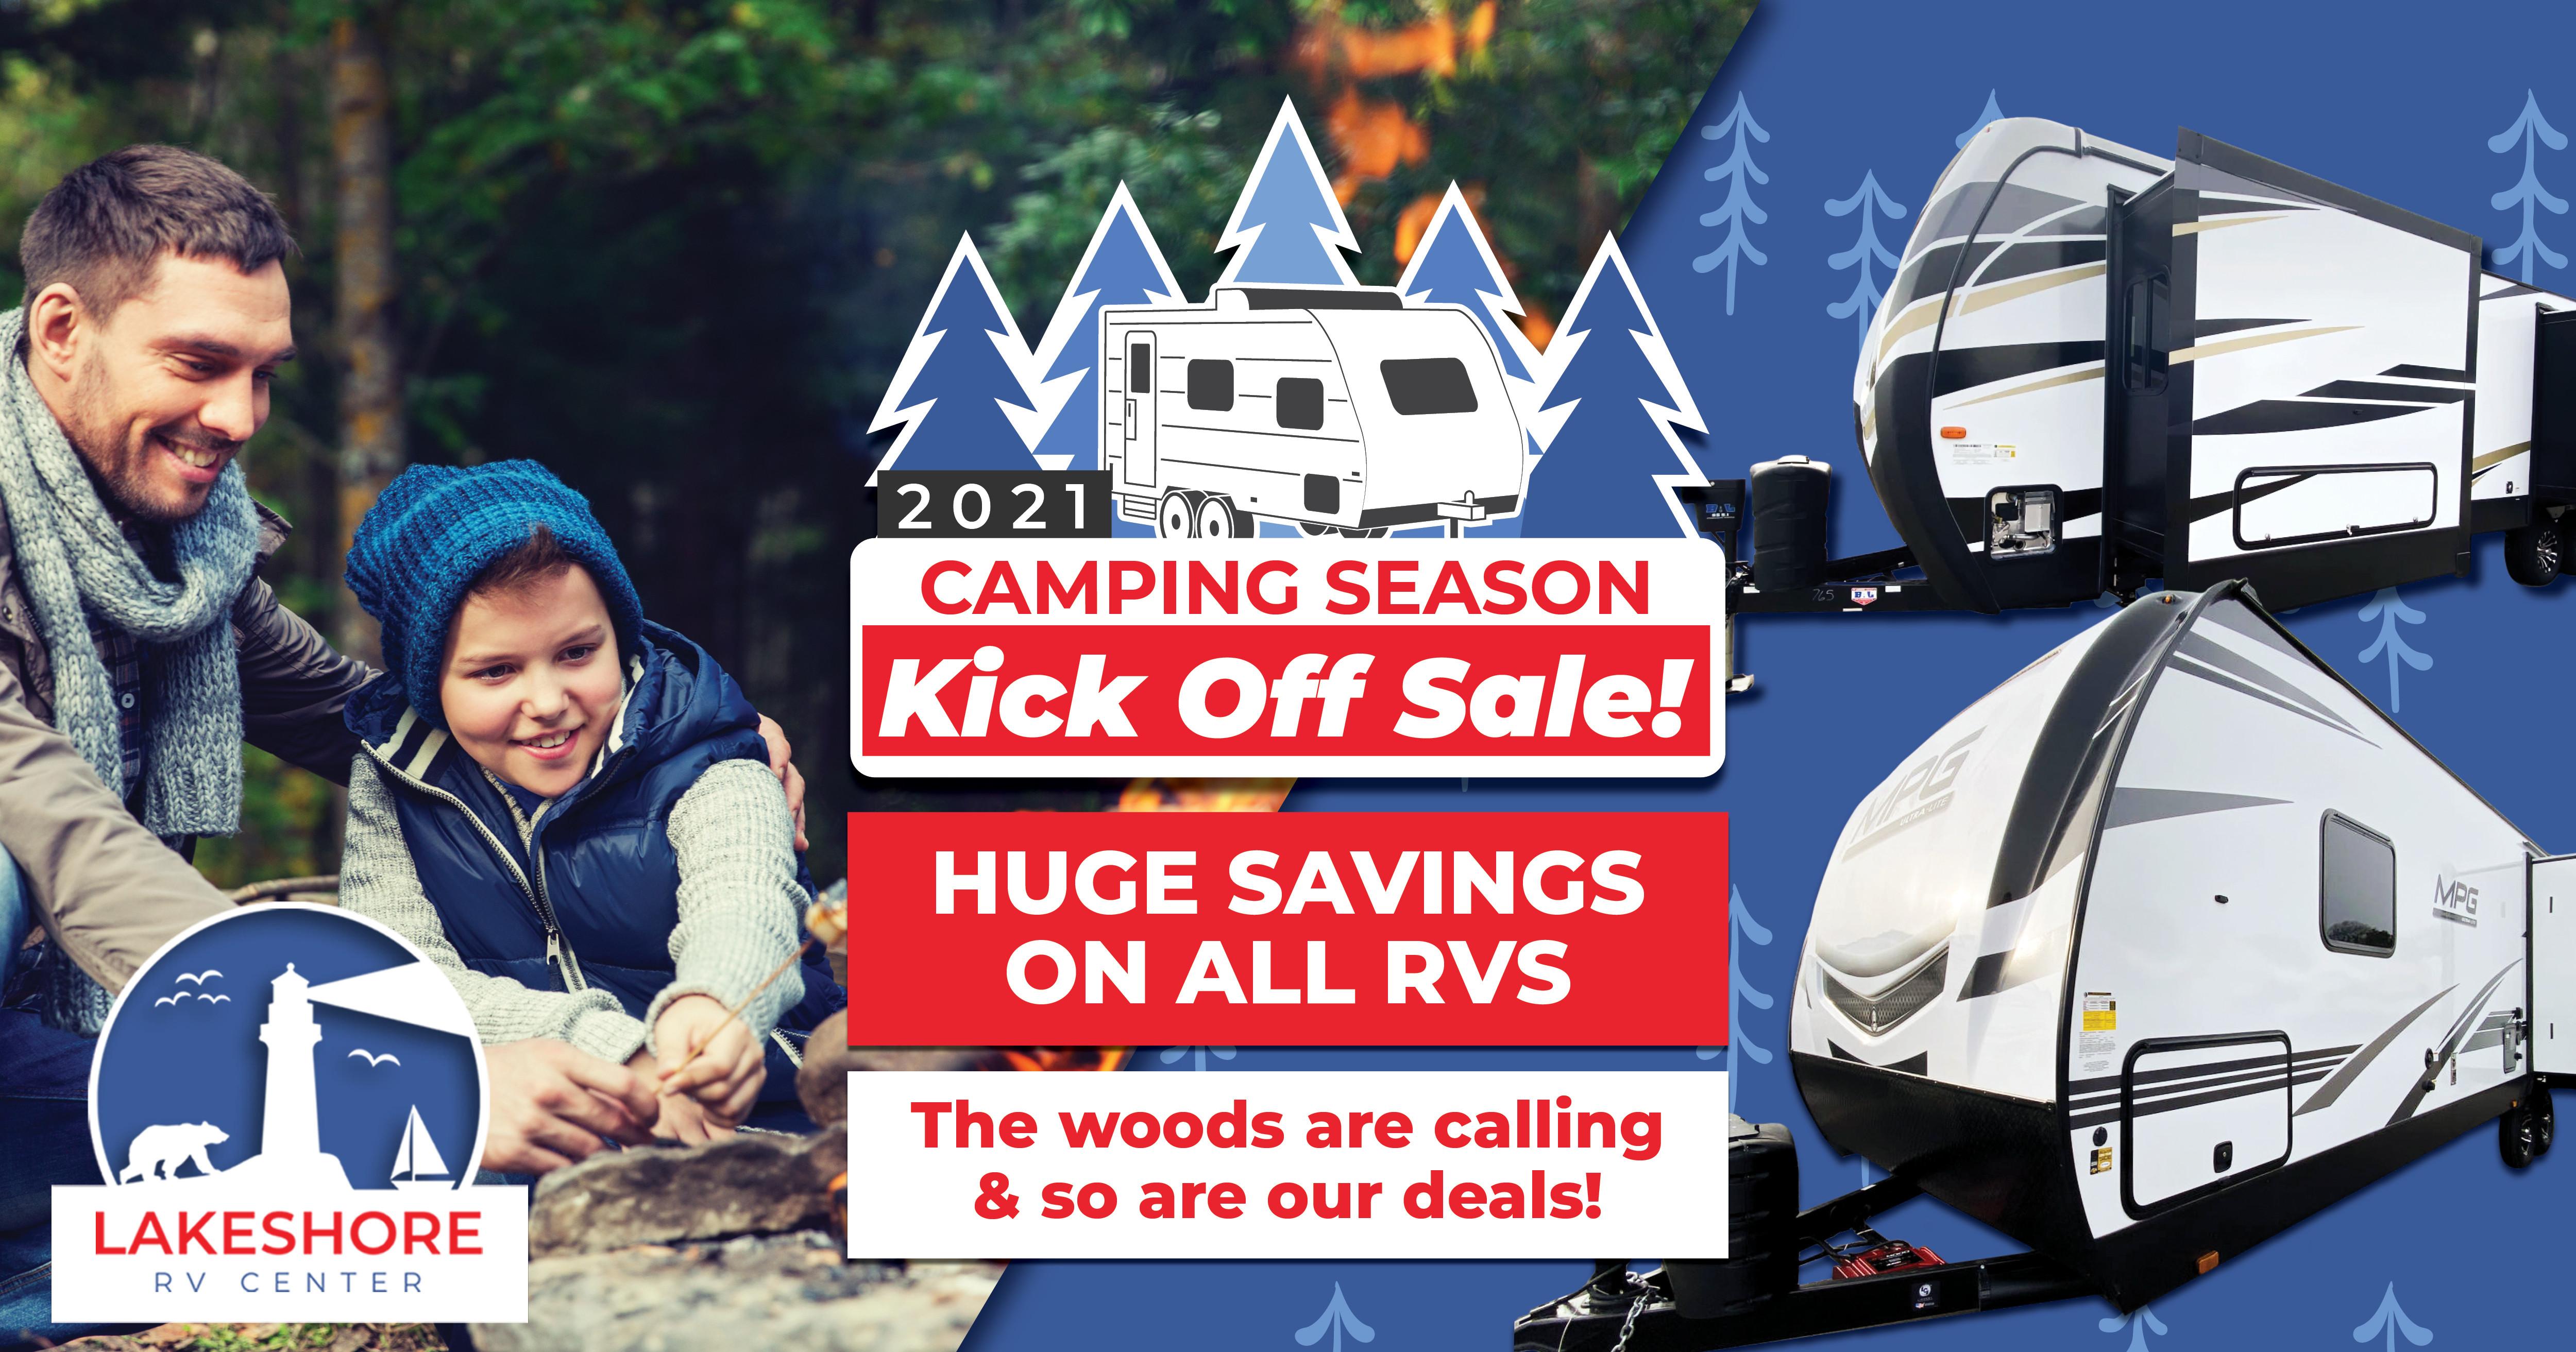 lsrv-camping-season-kickoff-sale-desc-banner-001